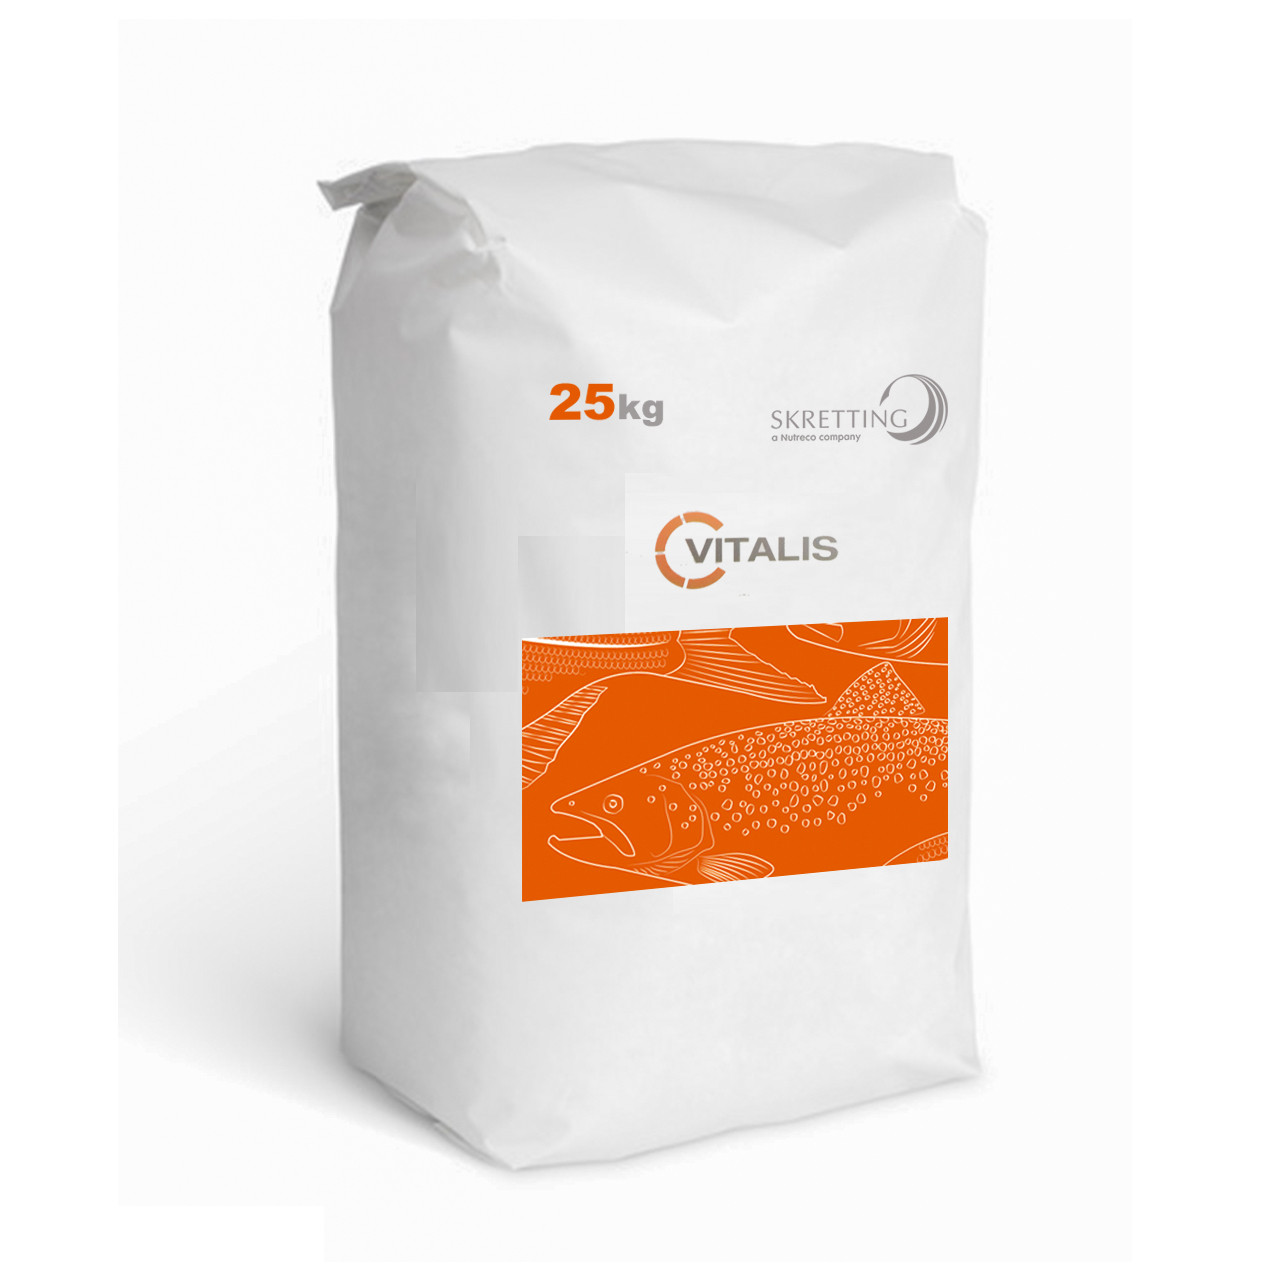 Alimento Skretting para Reproductores Marinos Vitalis REPRO de 13 mm